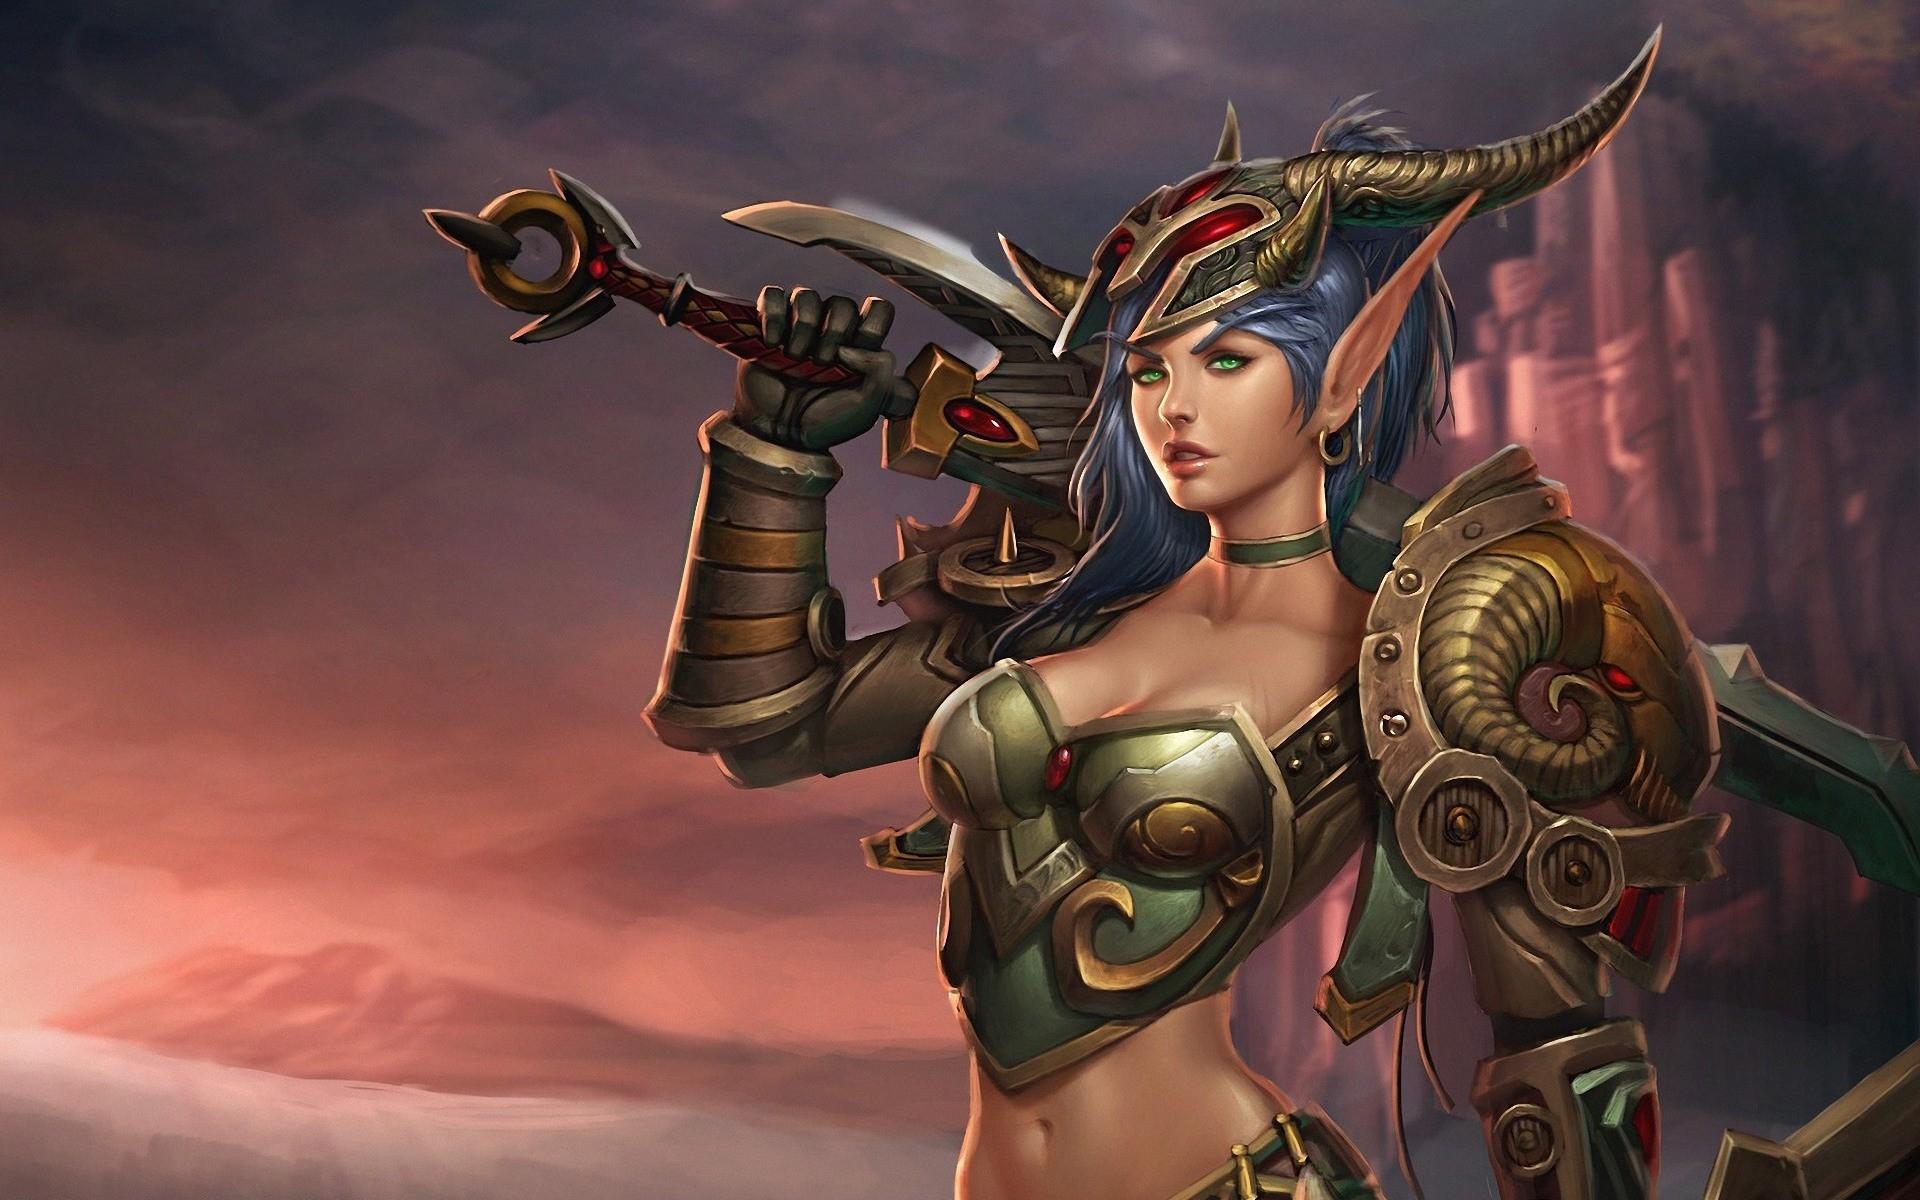 World of Warcraft HD Wallpaper